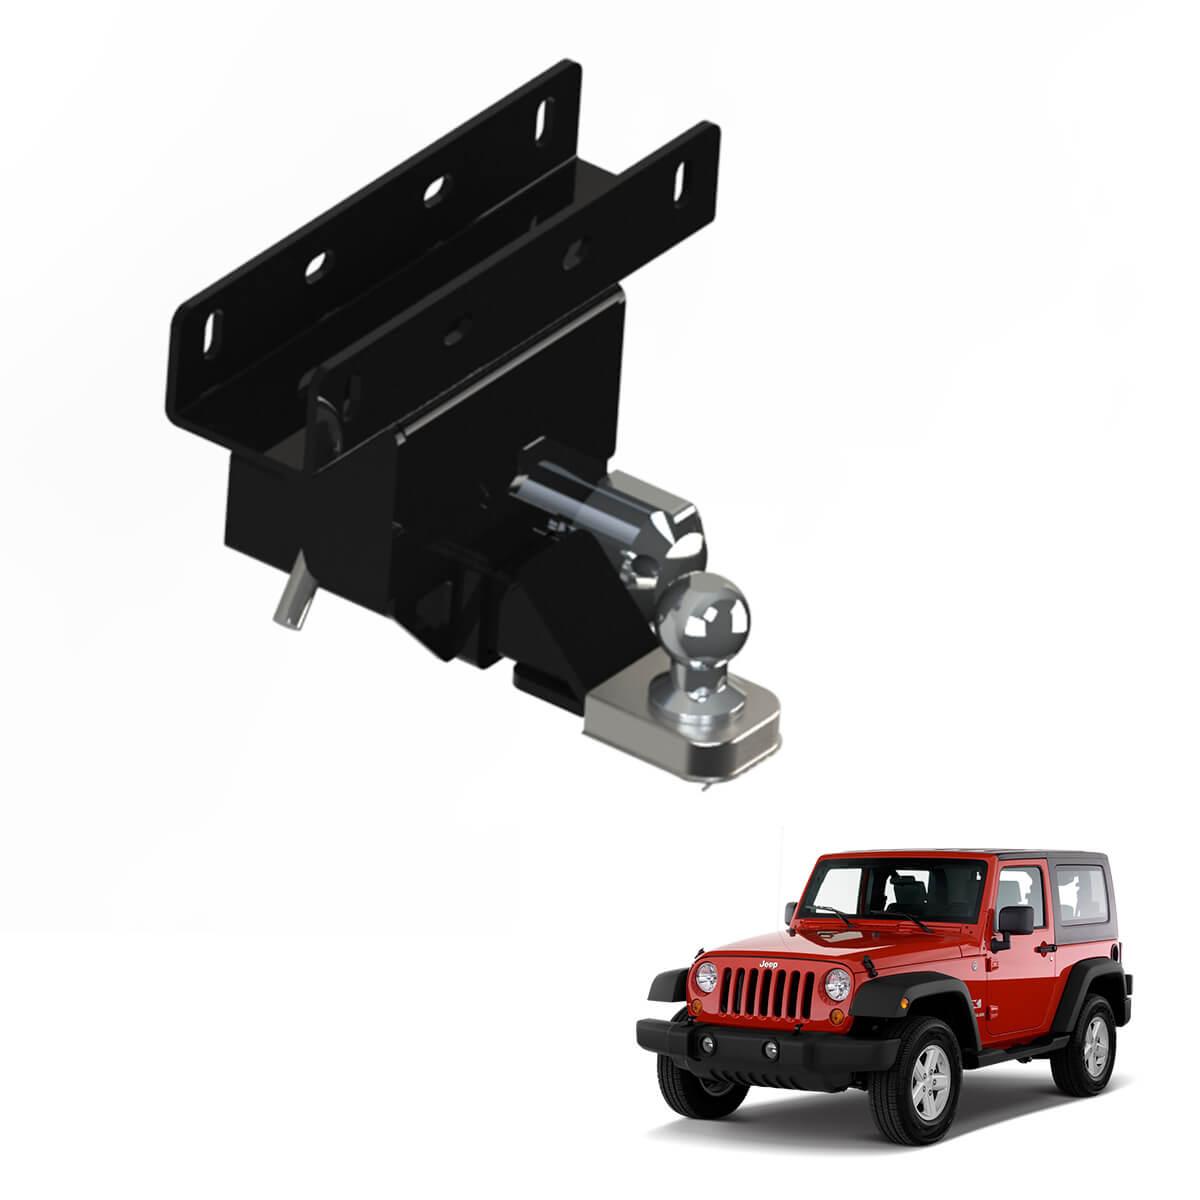 Engate de reboque Jeep Wrangler 2007 a 2016 removível 1500 Kg